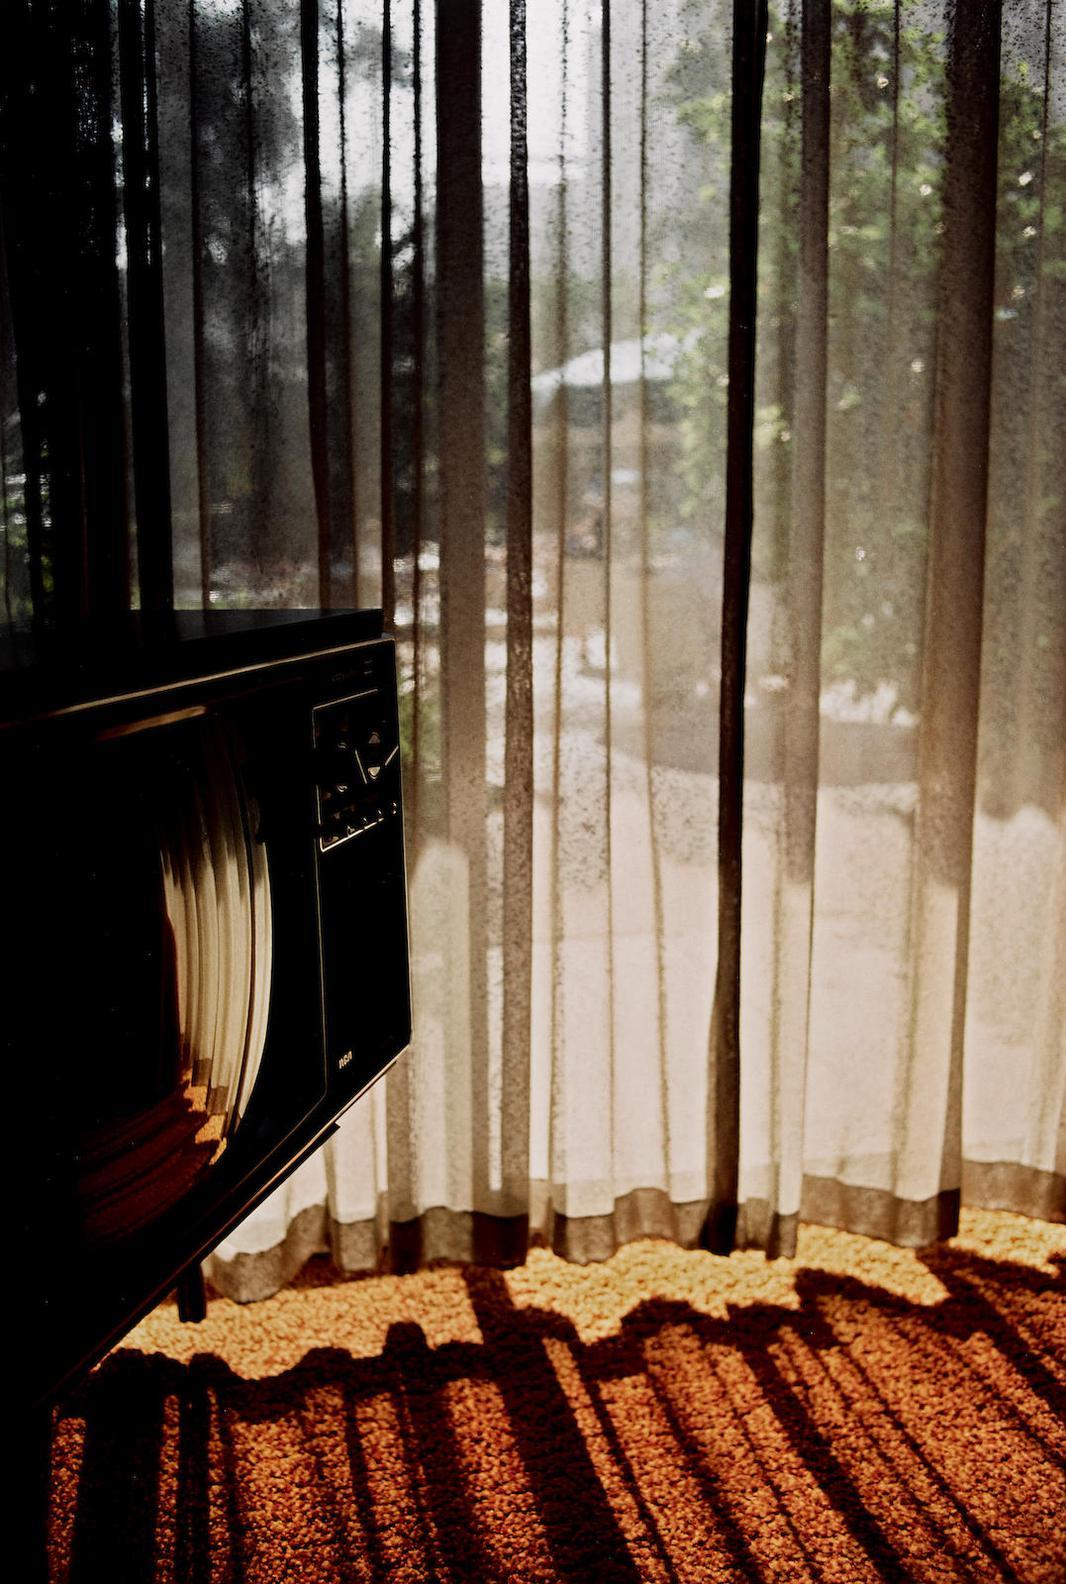 Ernst Haas-California, Usa-1976